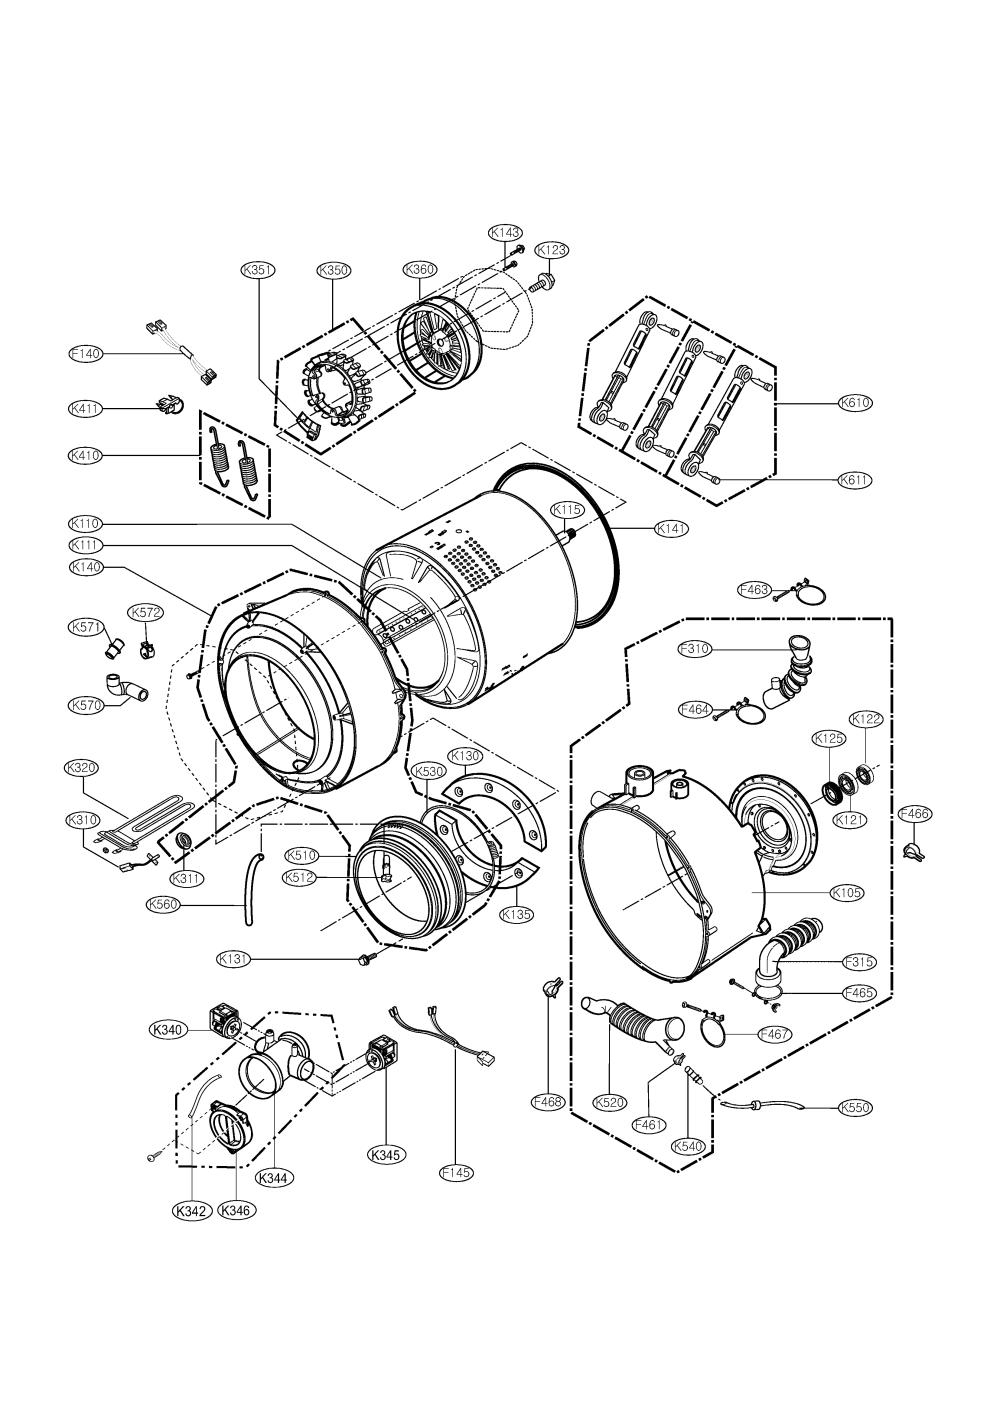 medium resolution of lg model wm1832cw residential washers genuine parts source washing machine wiring diagram ponent